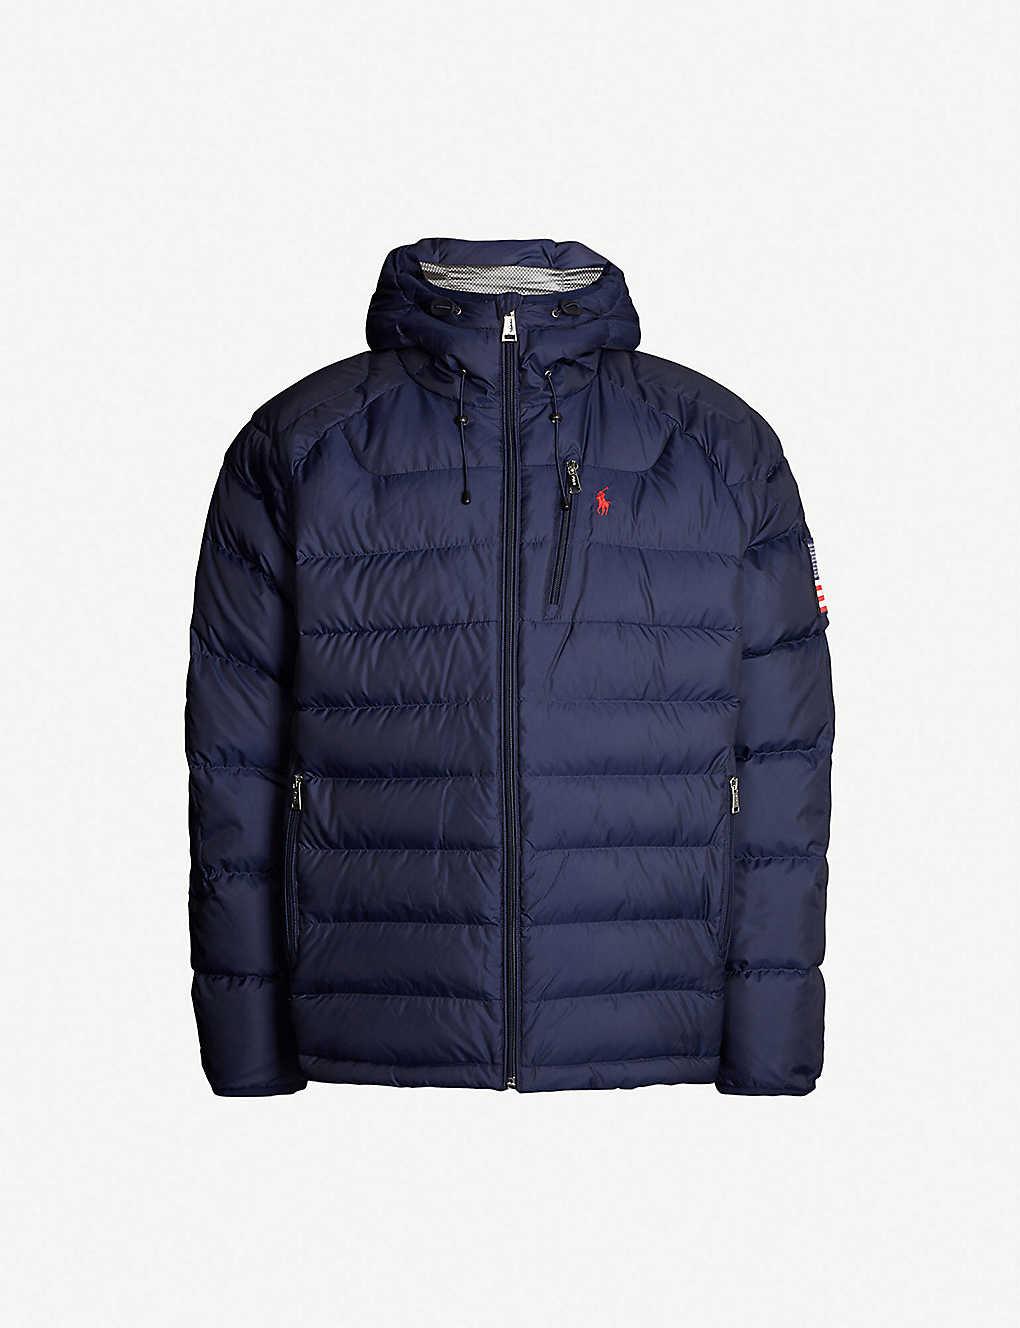 1e9601e4a4c1 POLO RALPH LAUREN - RL Heat Glacier shell-down puffer jacket ...